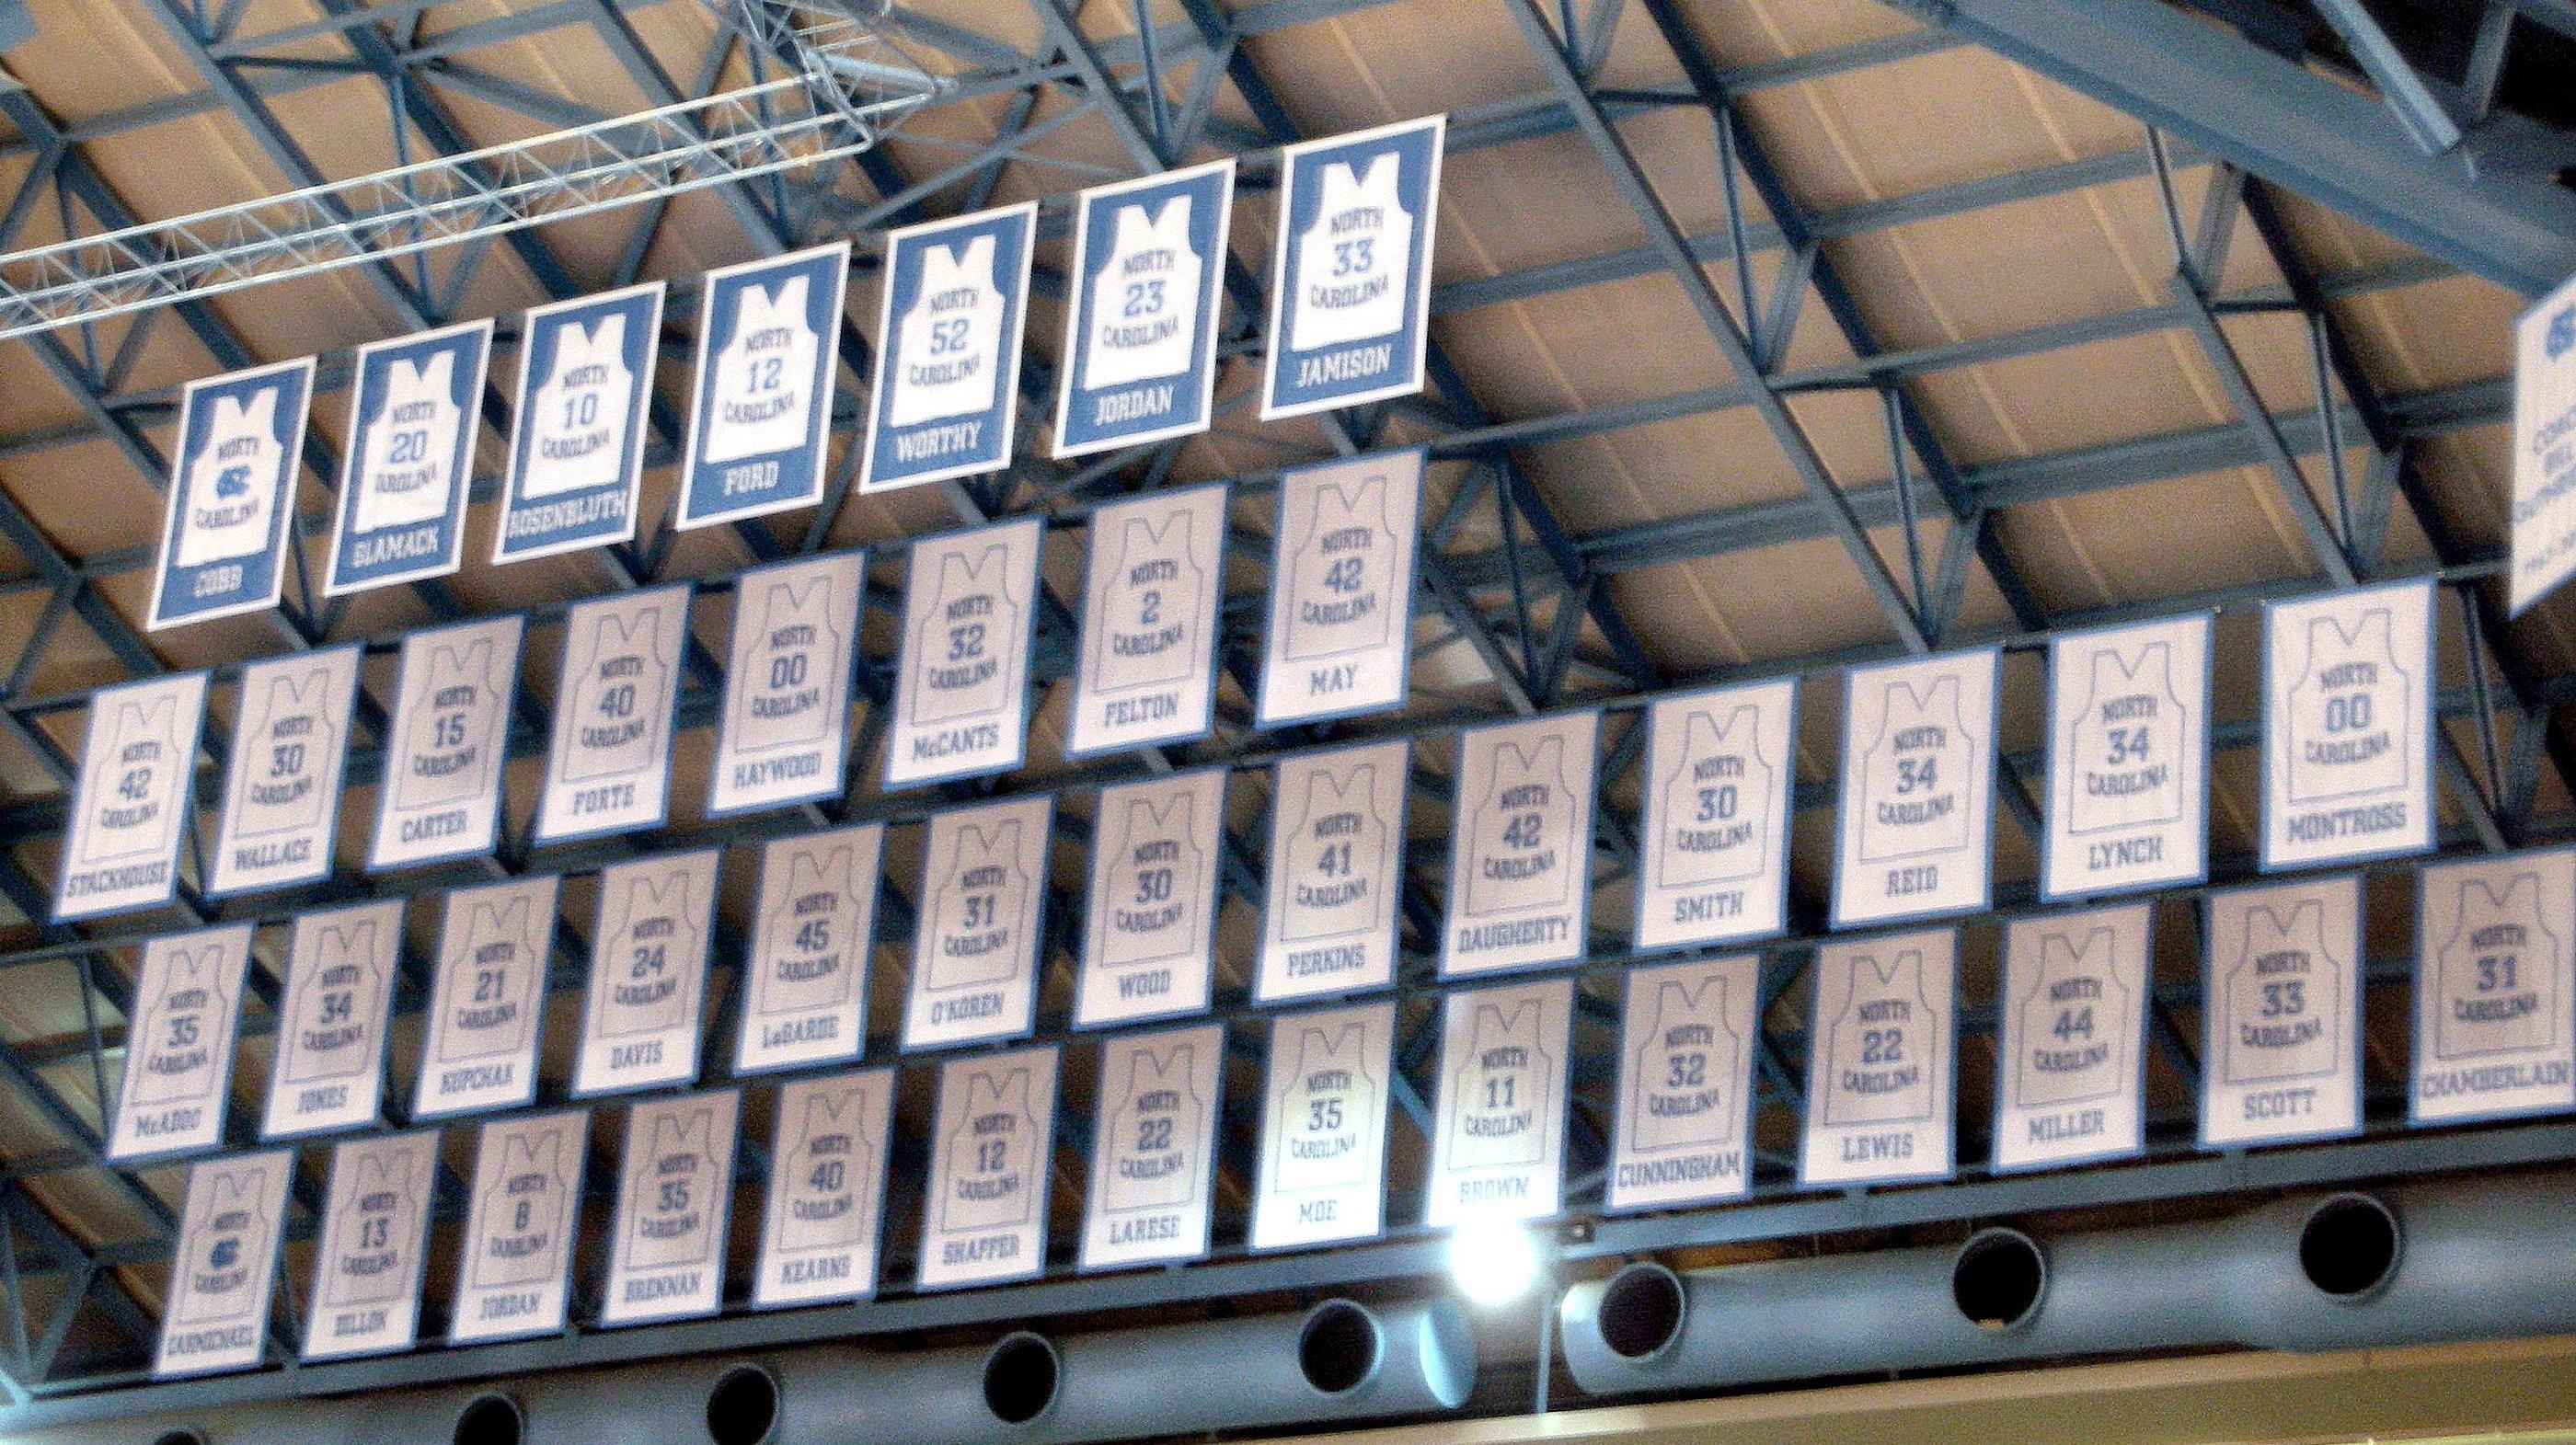 cc6b5fd9f8cd Honored North Carolina Tar Heels men s basketball players - Wikipedia